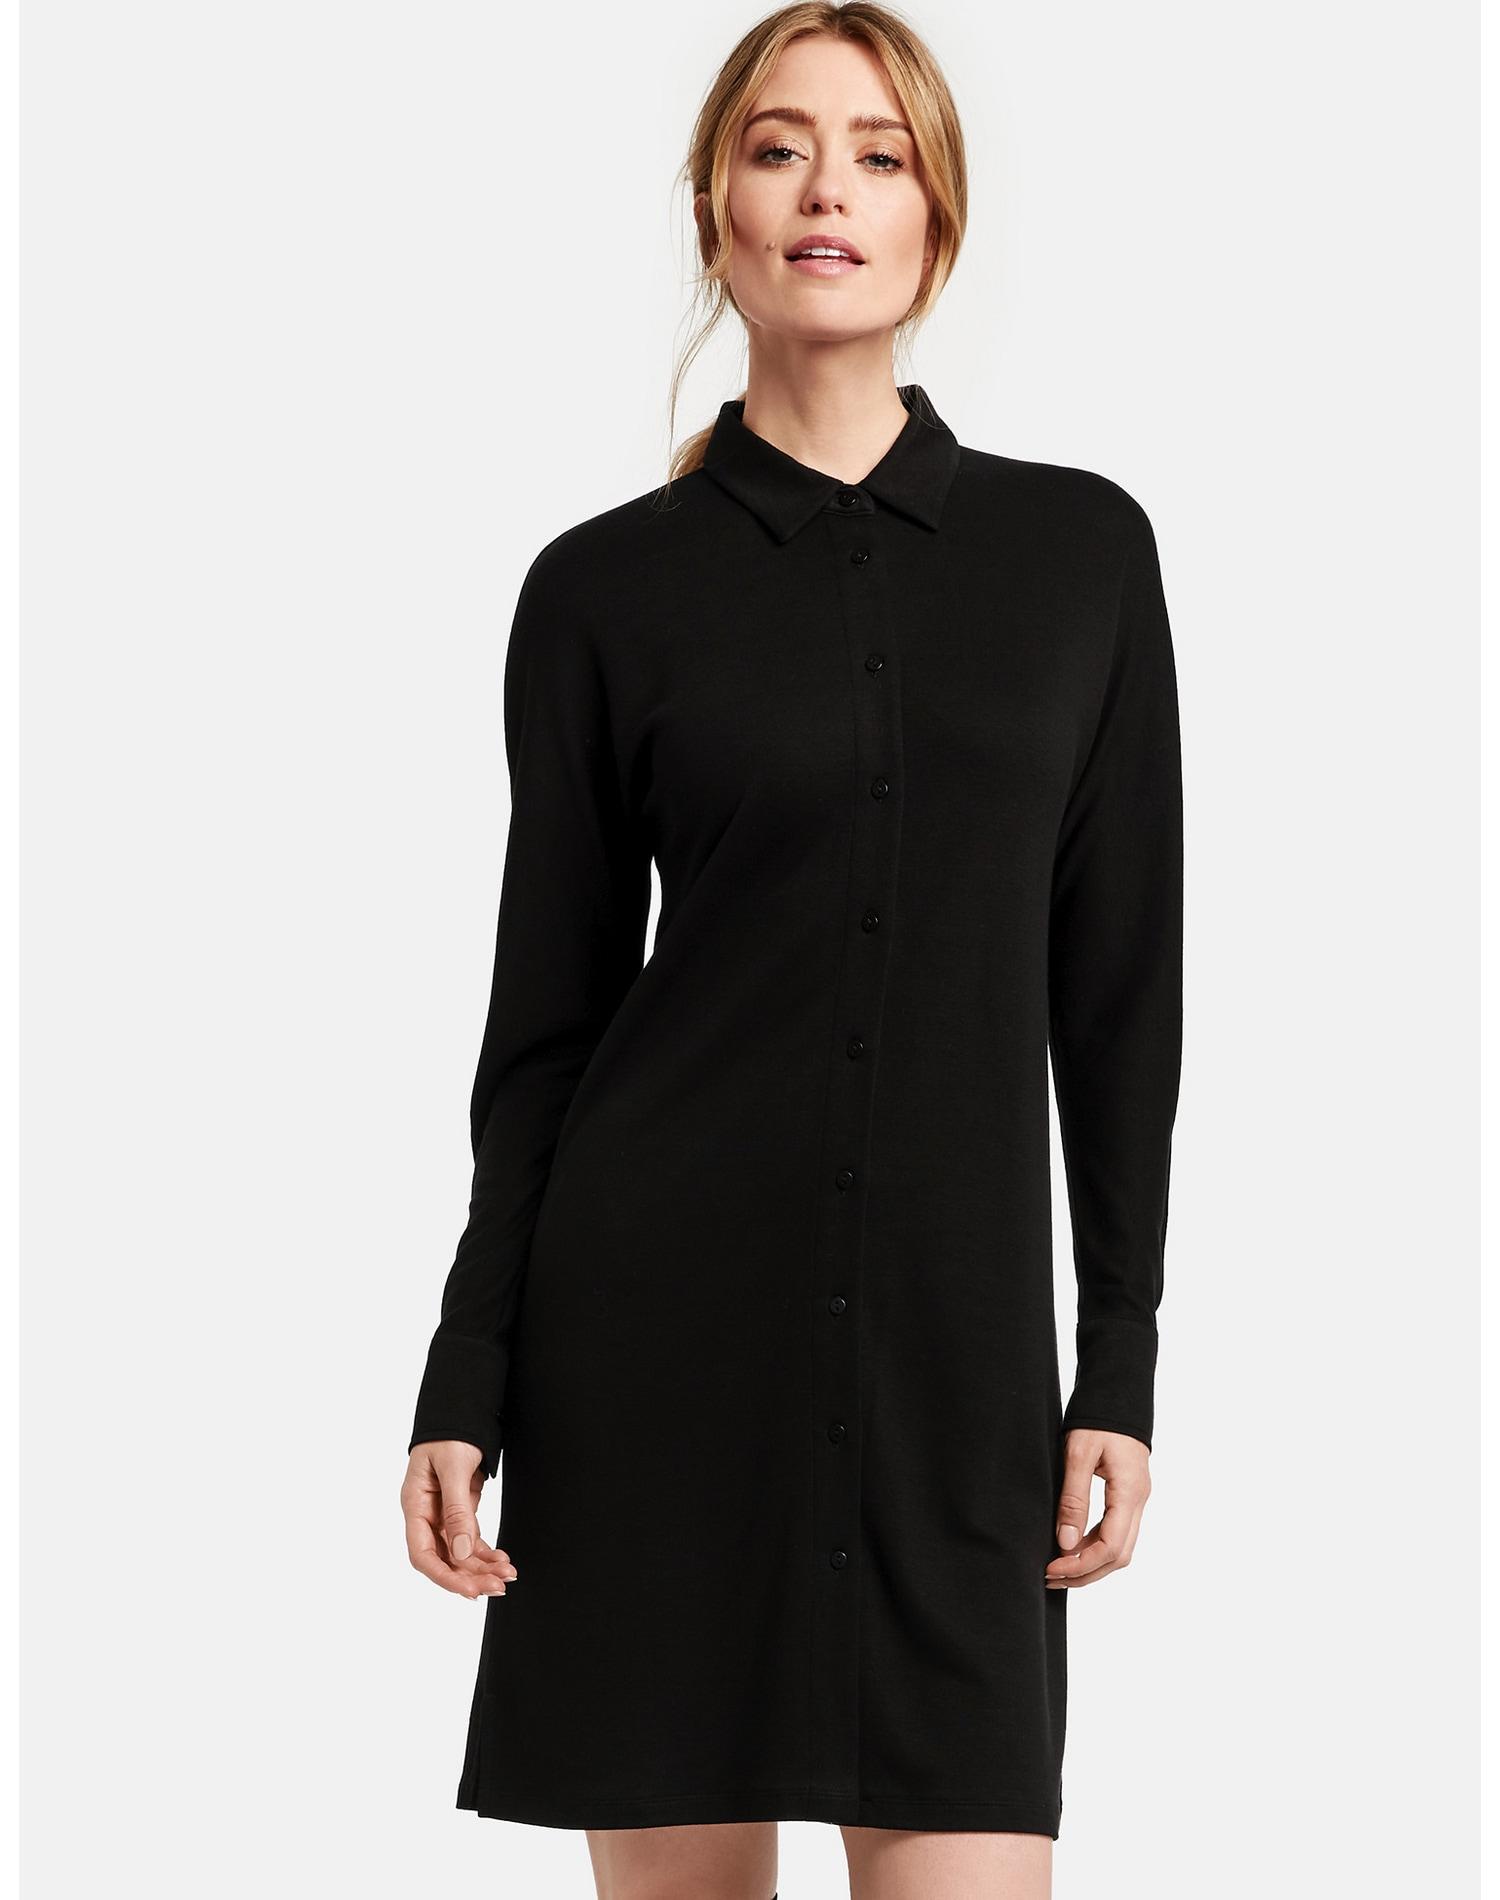 Image of GERRY WEBER Kleid Gewirke »Ausgestelltes Blusenkleid«